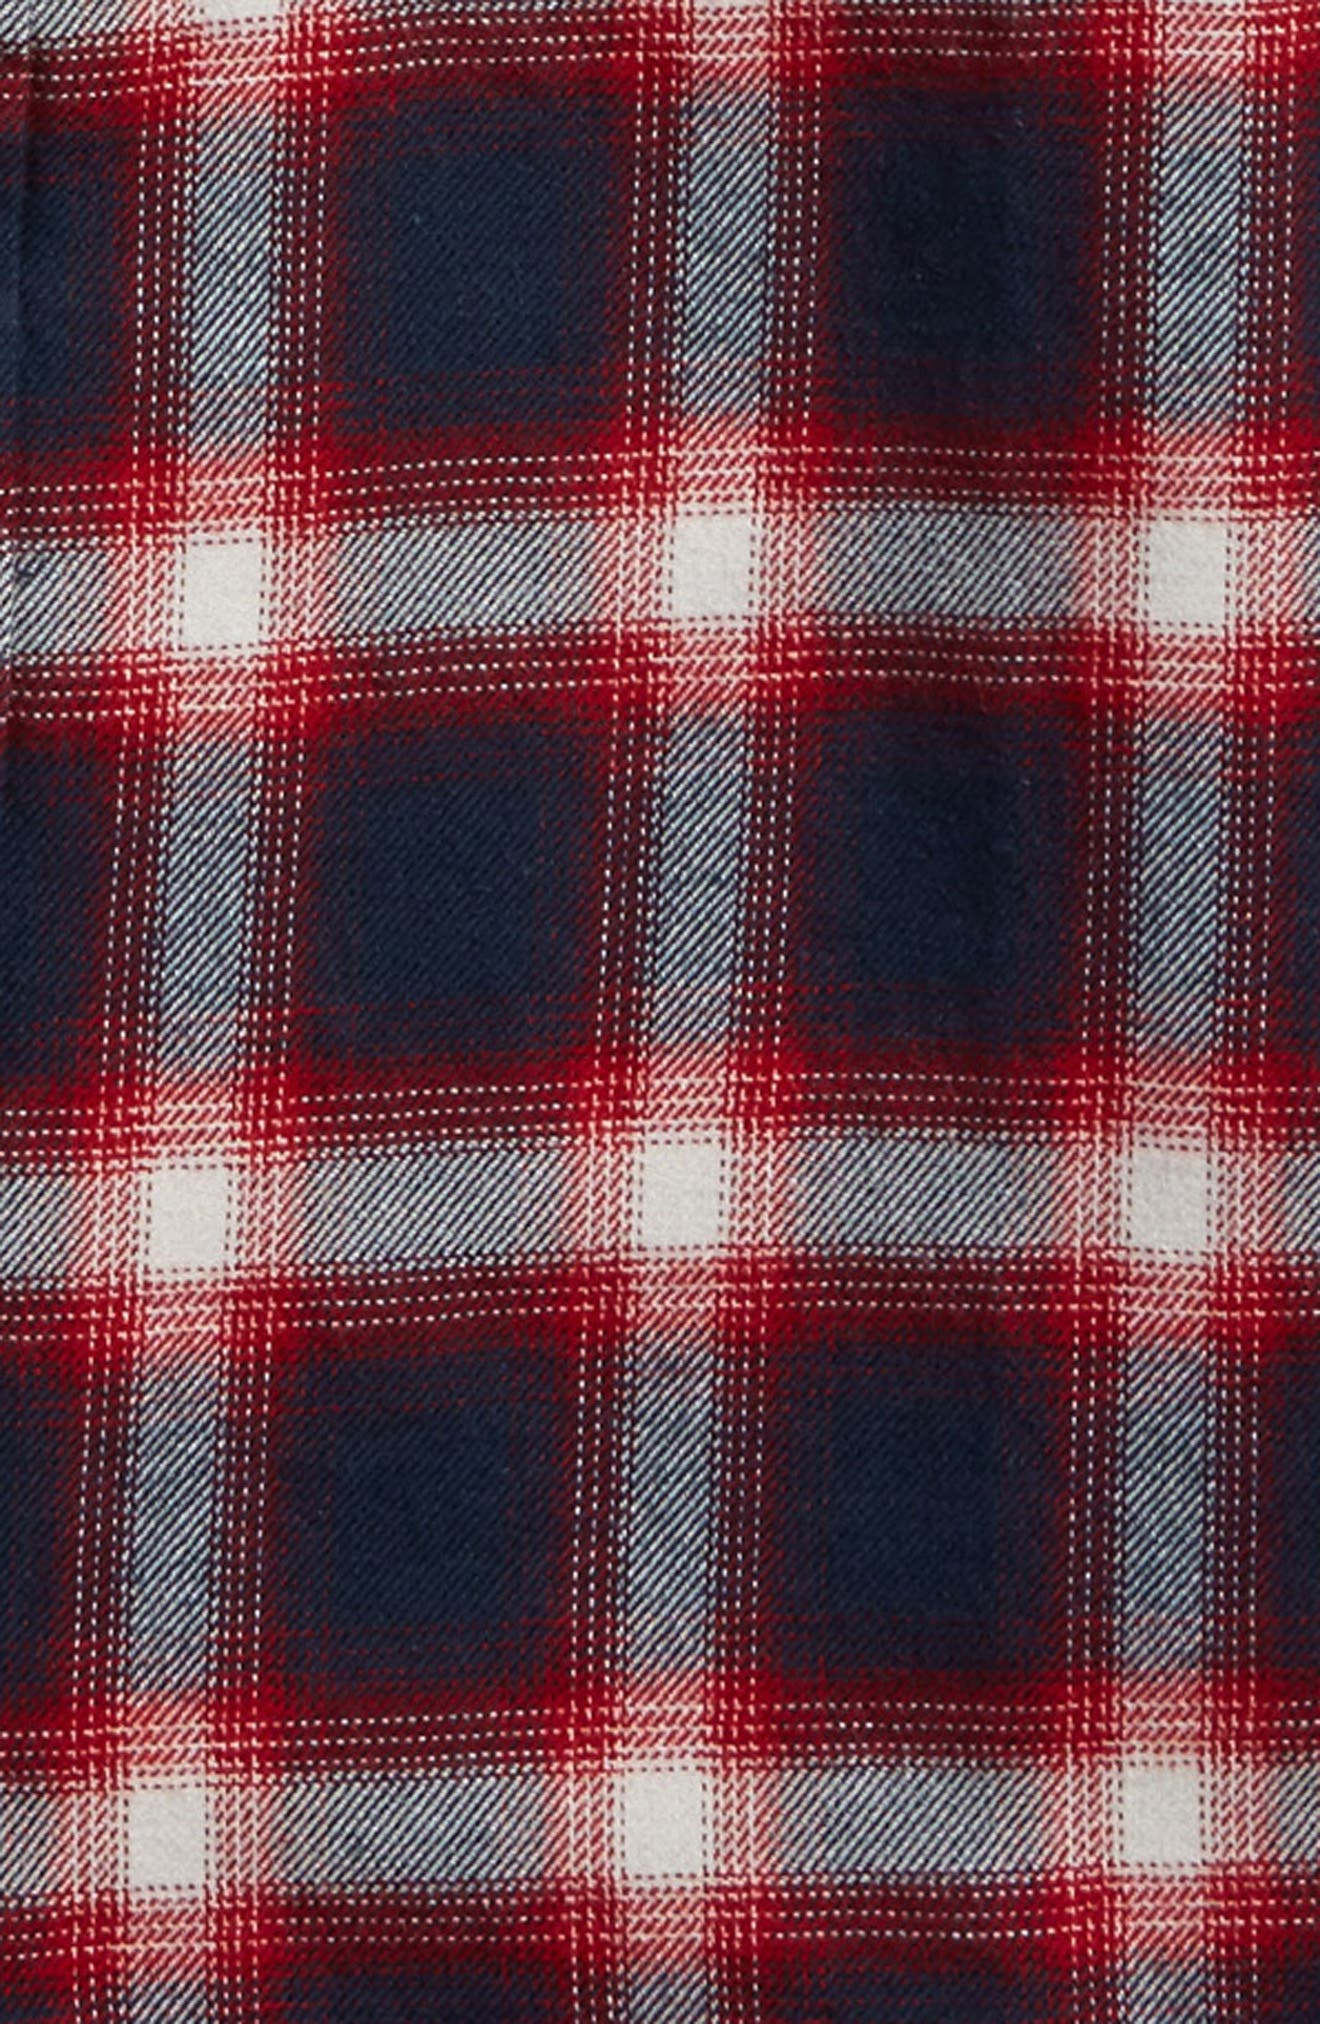 Beechwood Plaid Flannel Shirt,                             Alternate thumbnail 2, color,                             Dress Blues/ Chili Pepper